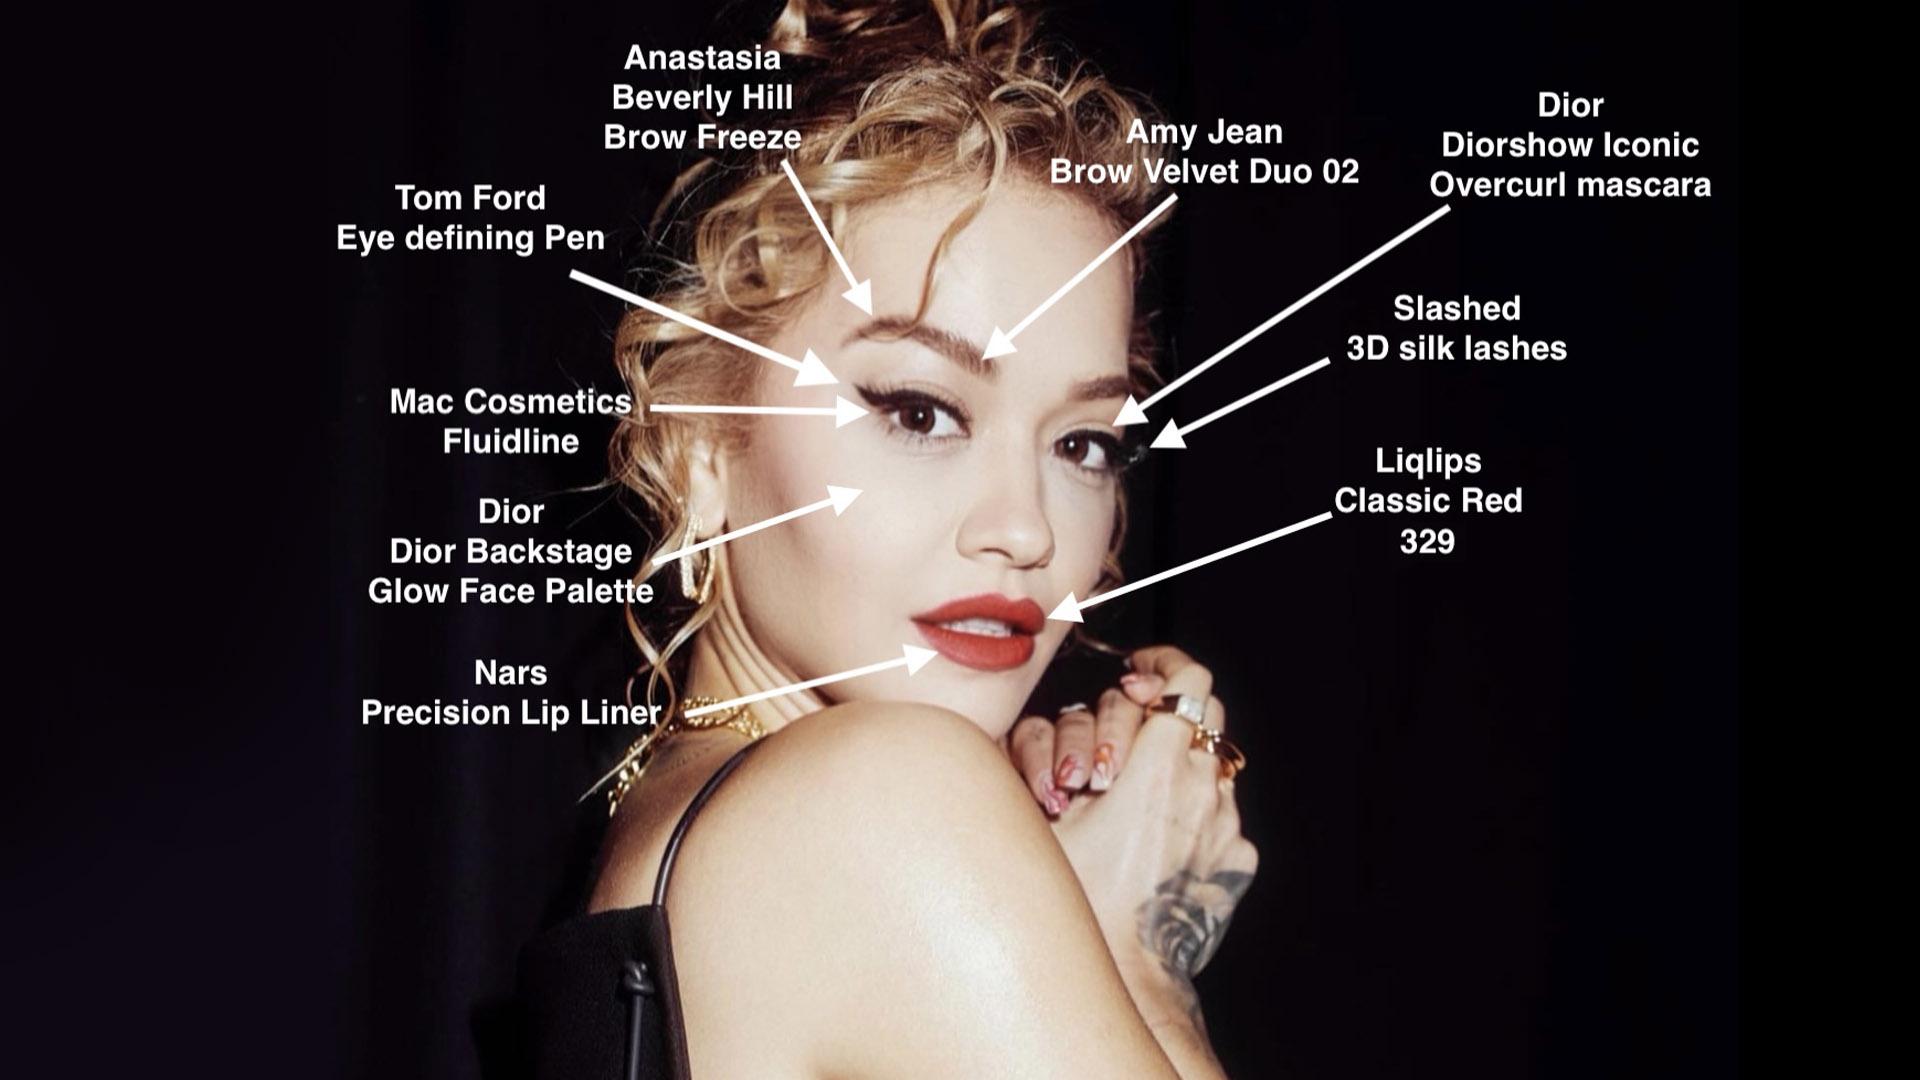 Rita Ora - The Voice - Winged Eye Red Lip - Facechart